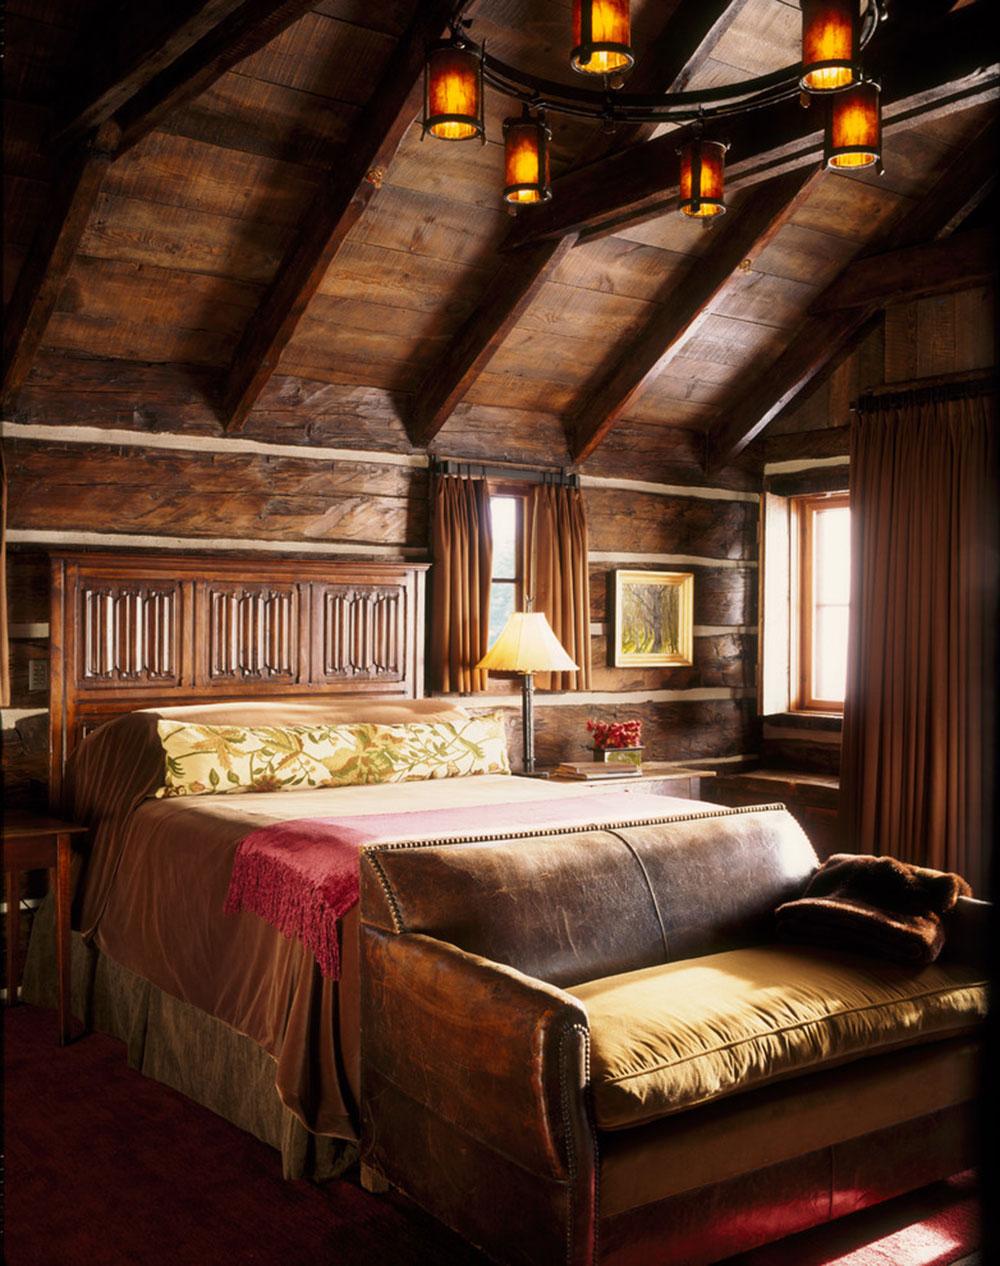 Rustik-sovrum-design-idéer-som-utstrålar-komfort-10 Rustik-sovrum-design-idéer som utstrålar komfort